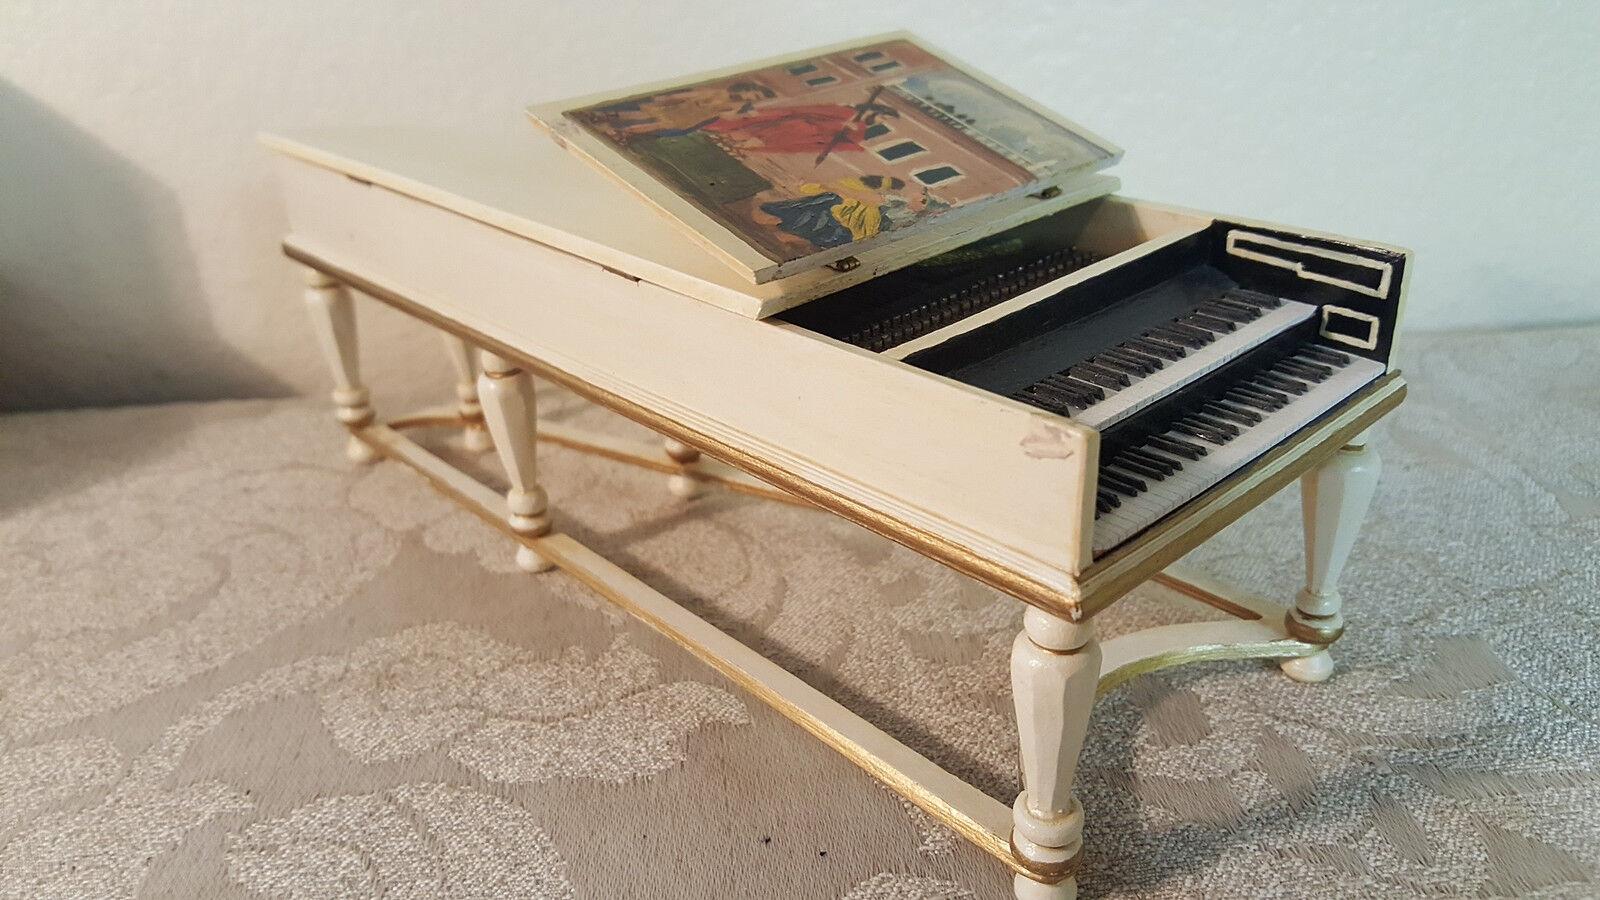 Ralph E. Partelow HH-1 1734 Harpsichord 1 of 8 doll house Größe piano